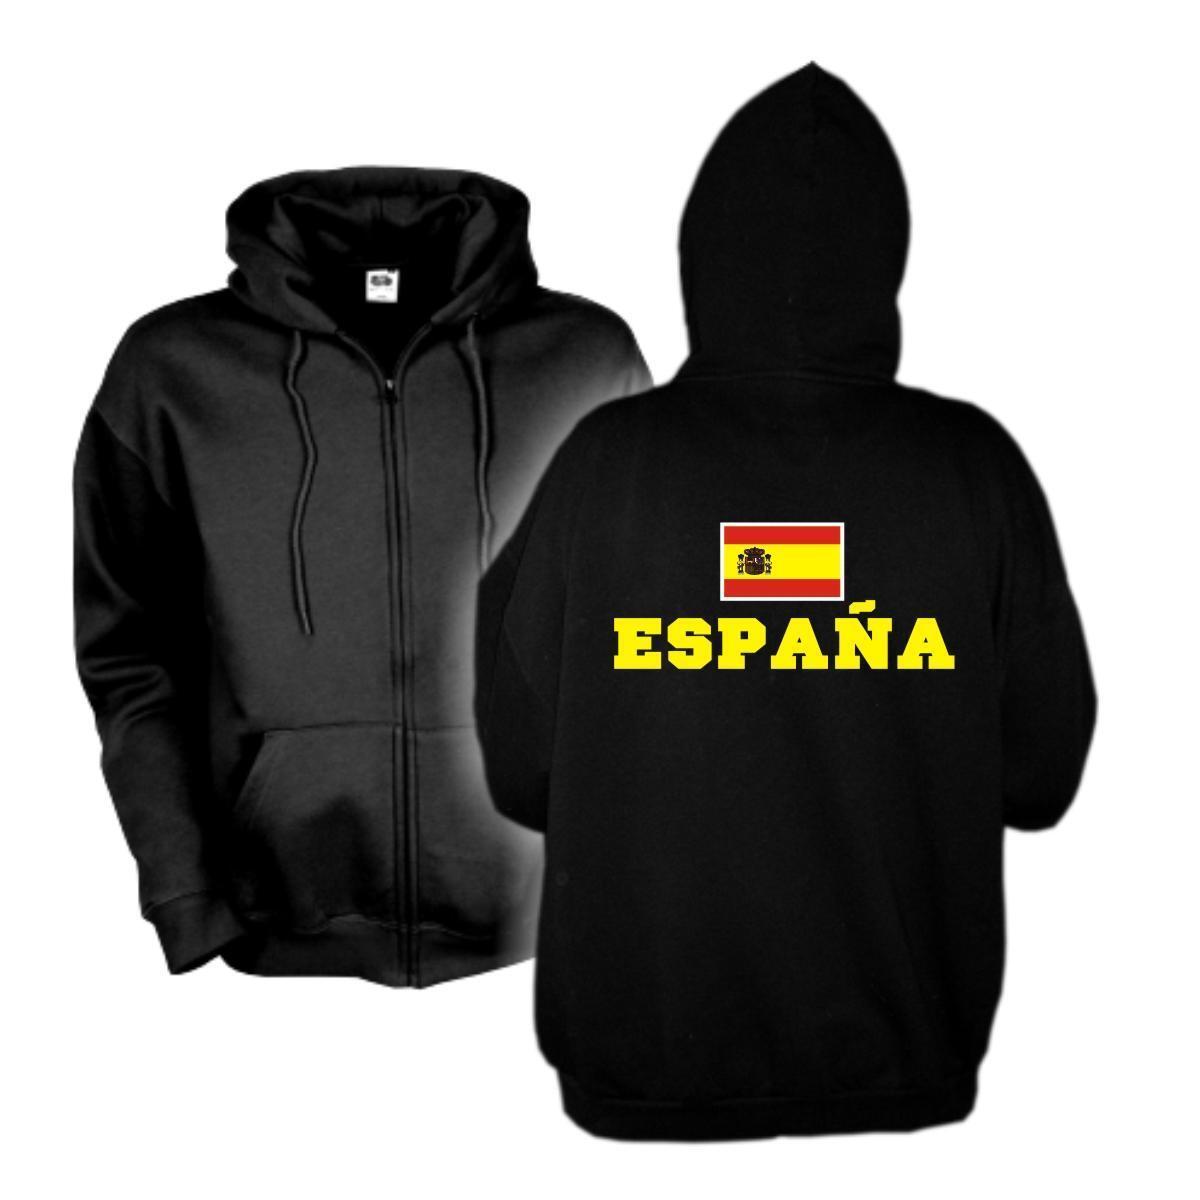 Kapuzenjacke SPANIEN Espana Flagshirt Zip Hoodie Sweatjacke S-6XL (WMS02-60e)